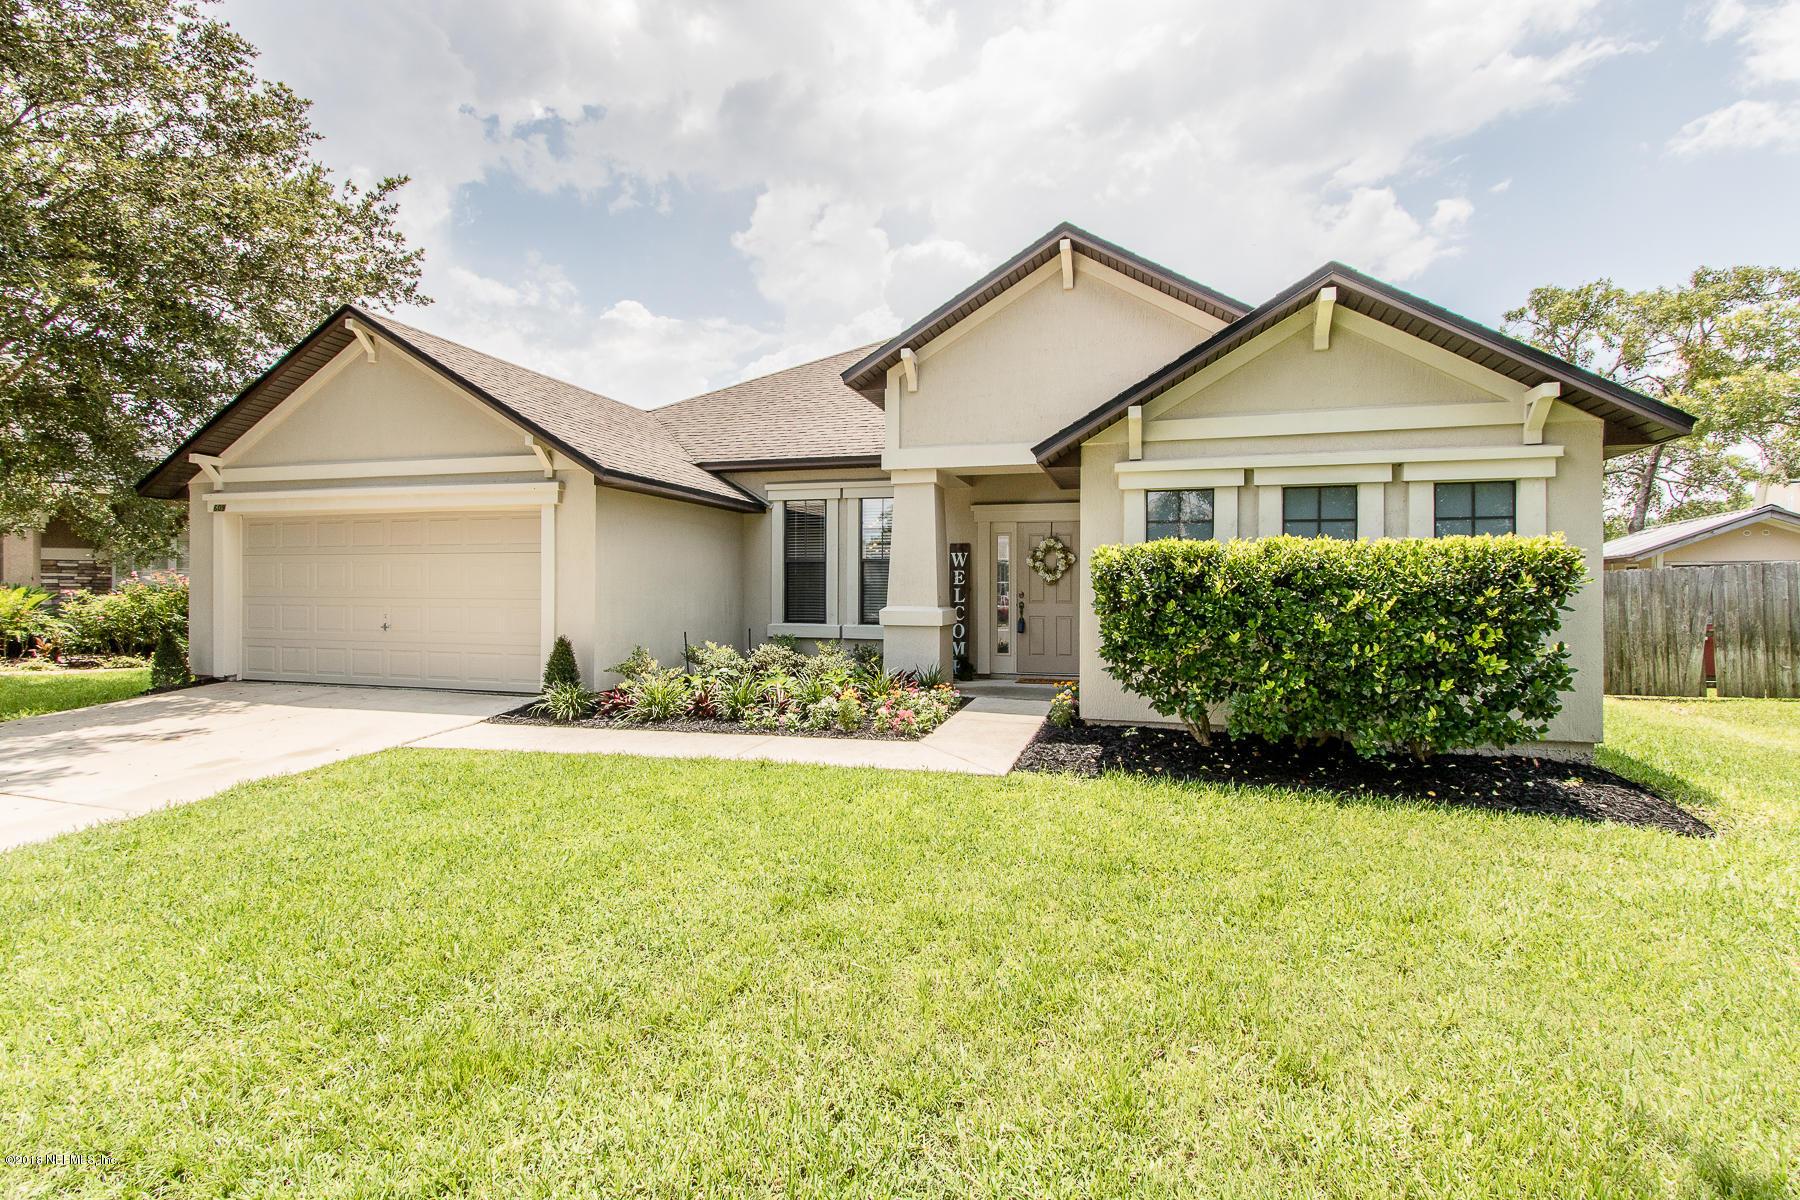 609 INWOOD, ORANGE PARK, FLORIDA 32065, 4 Bedrooms Bedrooms, ,3 BathroomsBathrooms,Residential - single family,For sale,INWOOD,943048